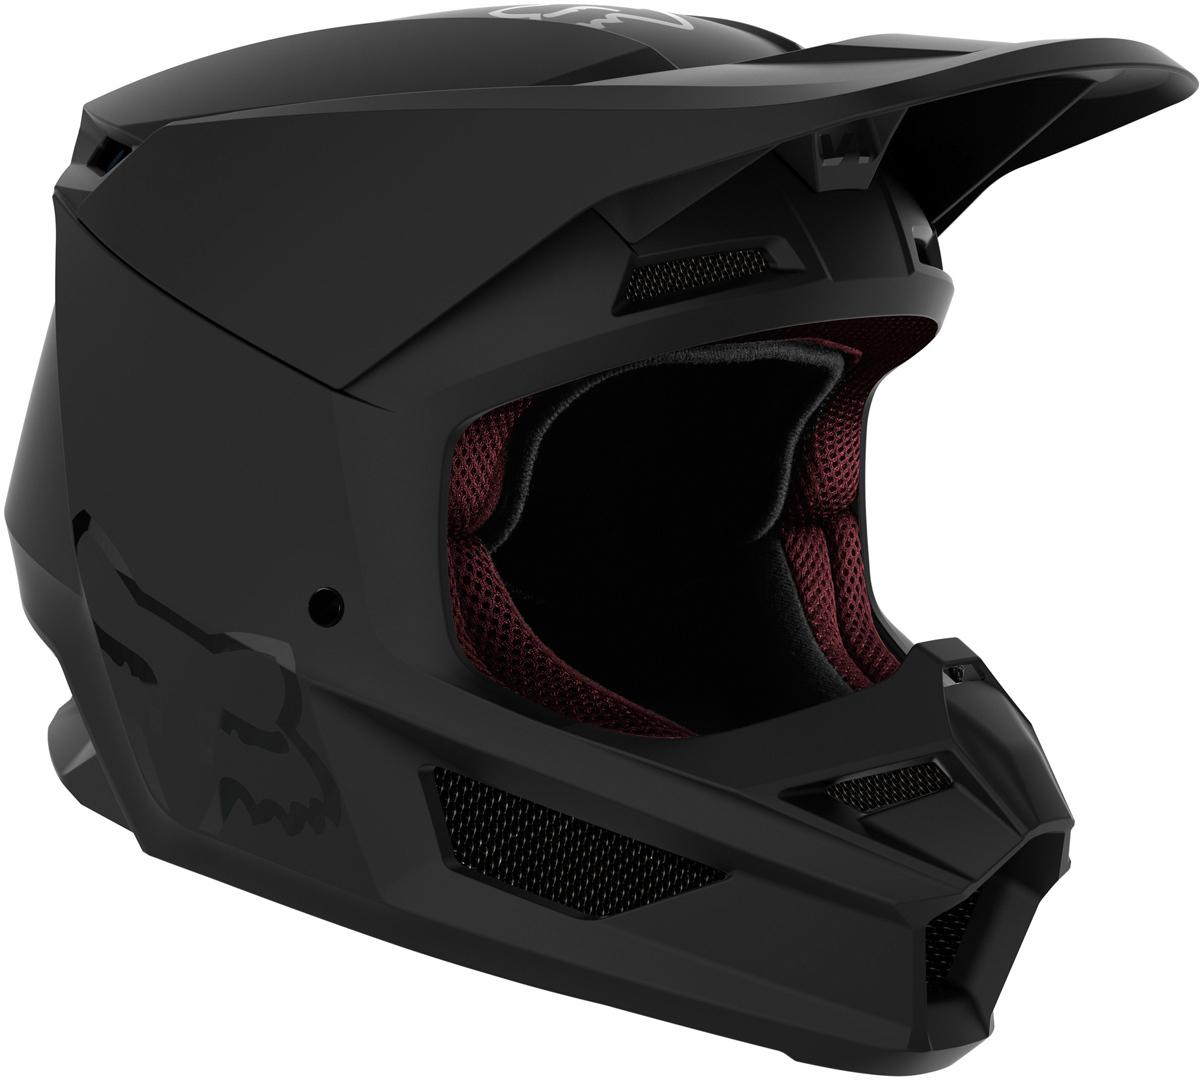 FOX V1 Matte Jugend Motocross Helm, schwarz, Größe S, schwarz, Größe S